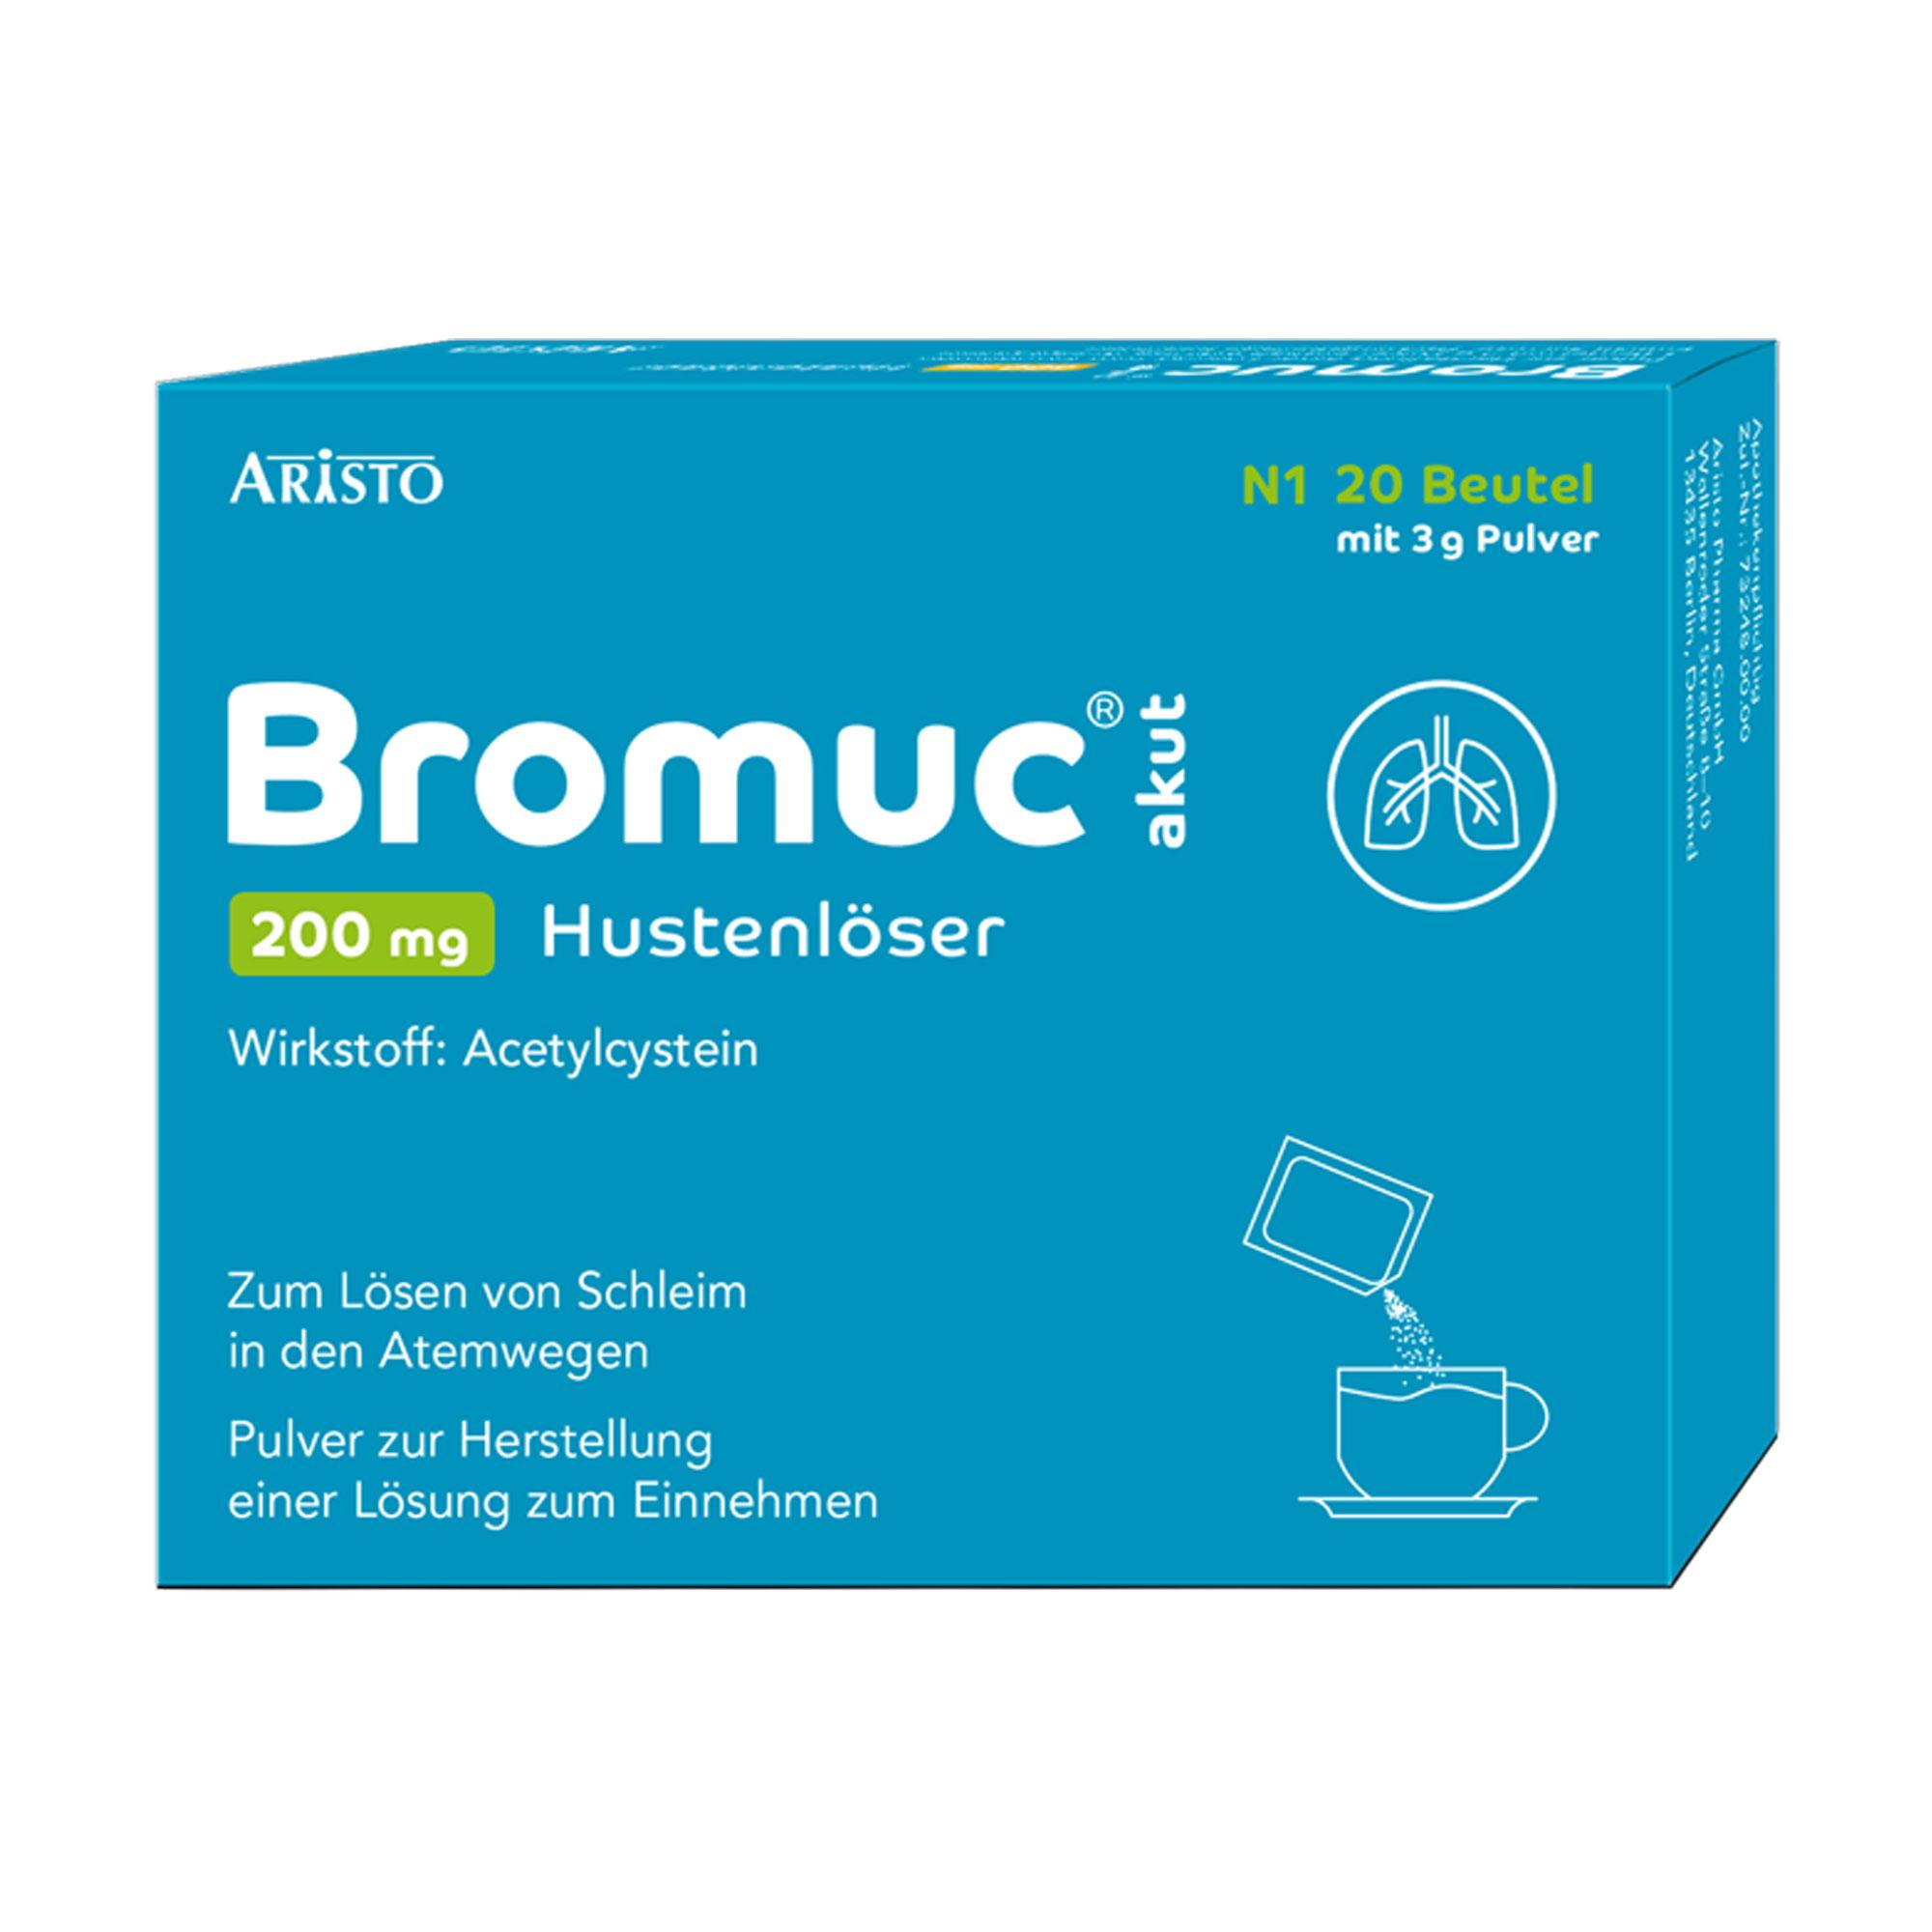 Bromuc akut 200 mg Hustenlöser